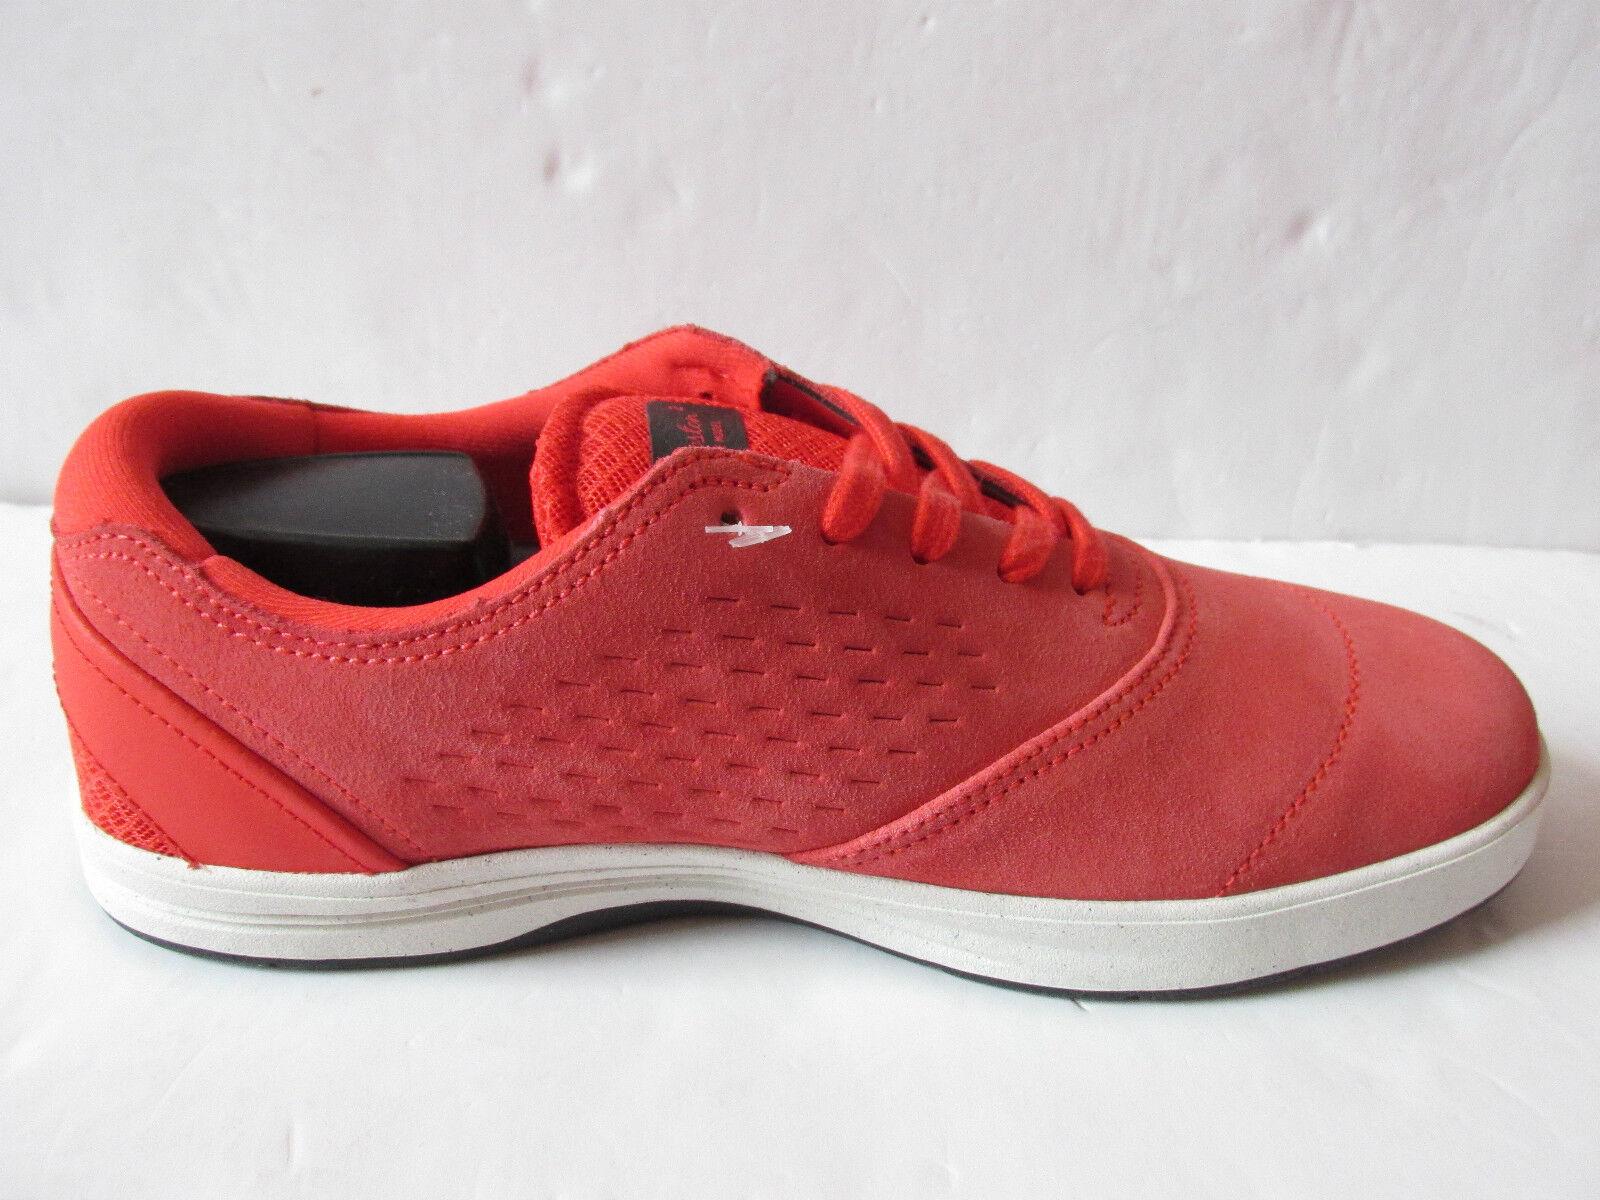 nike SB eric koston 2 signature modal mens trainers 580418 603 sneakers shoes